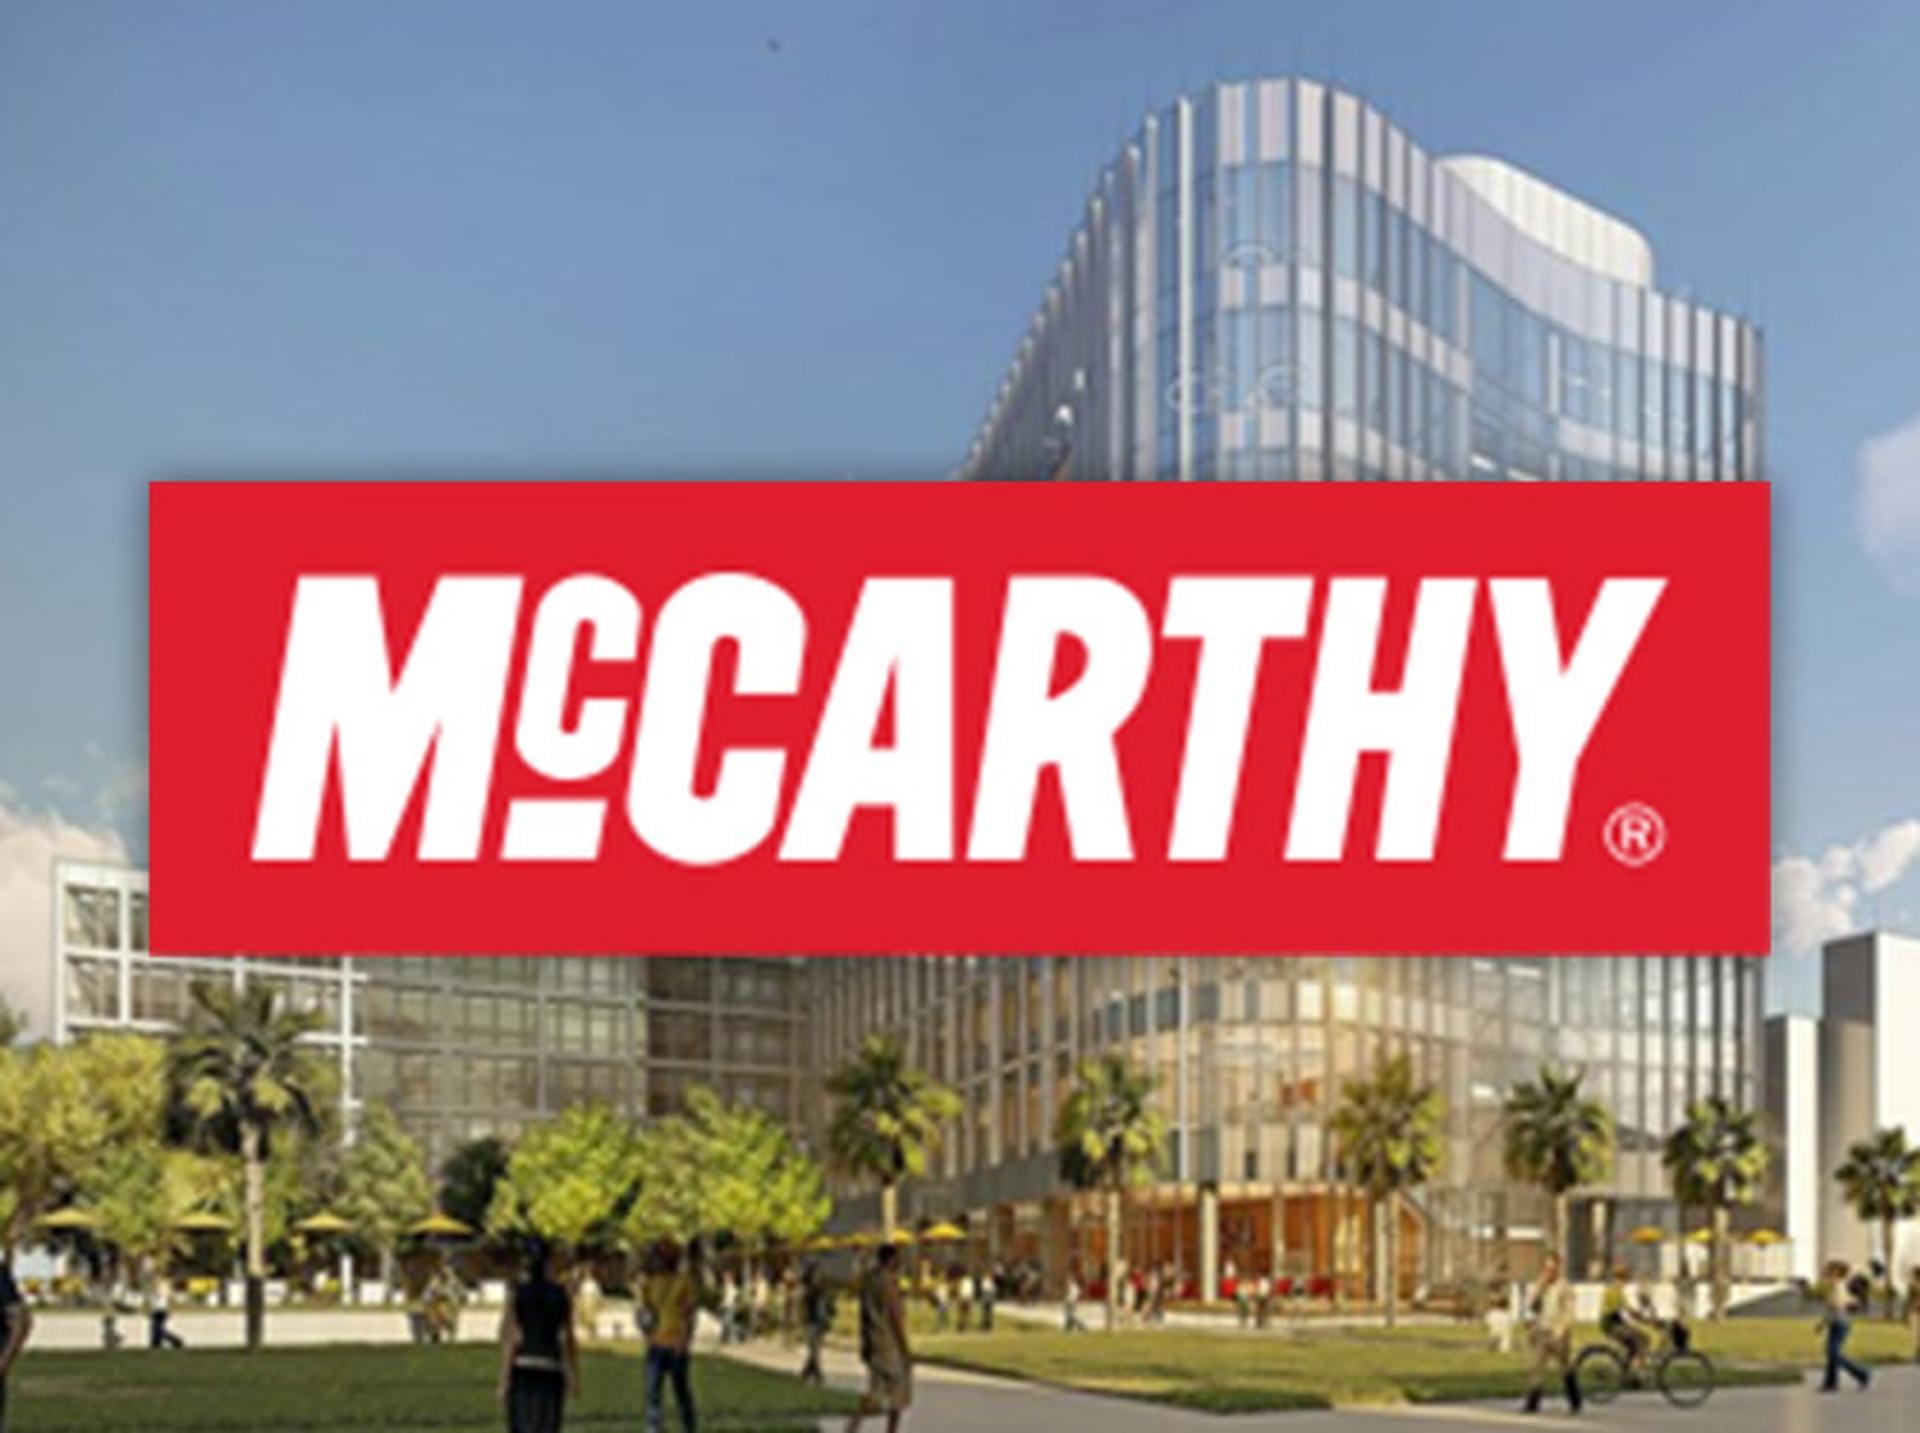 335x250-cc-mccarthy-2x